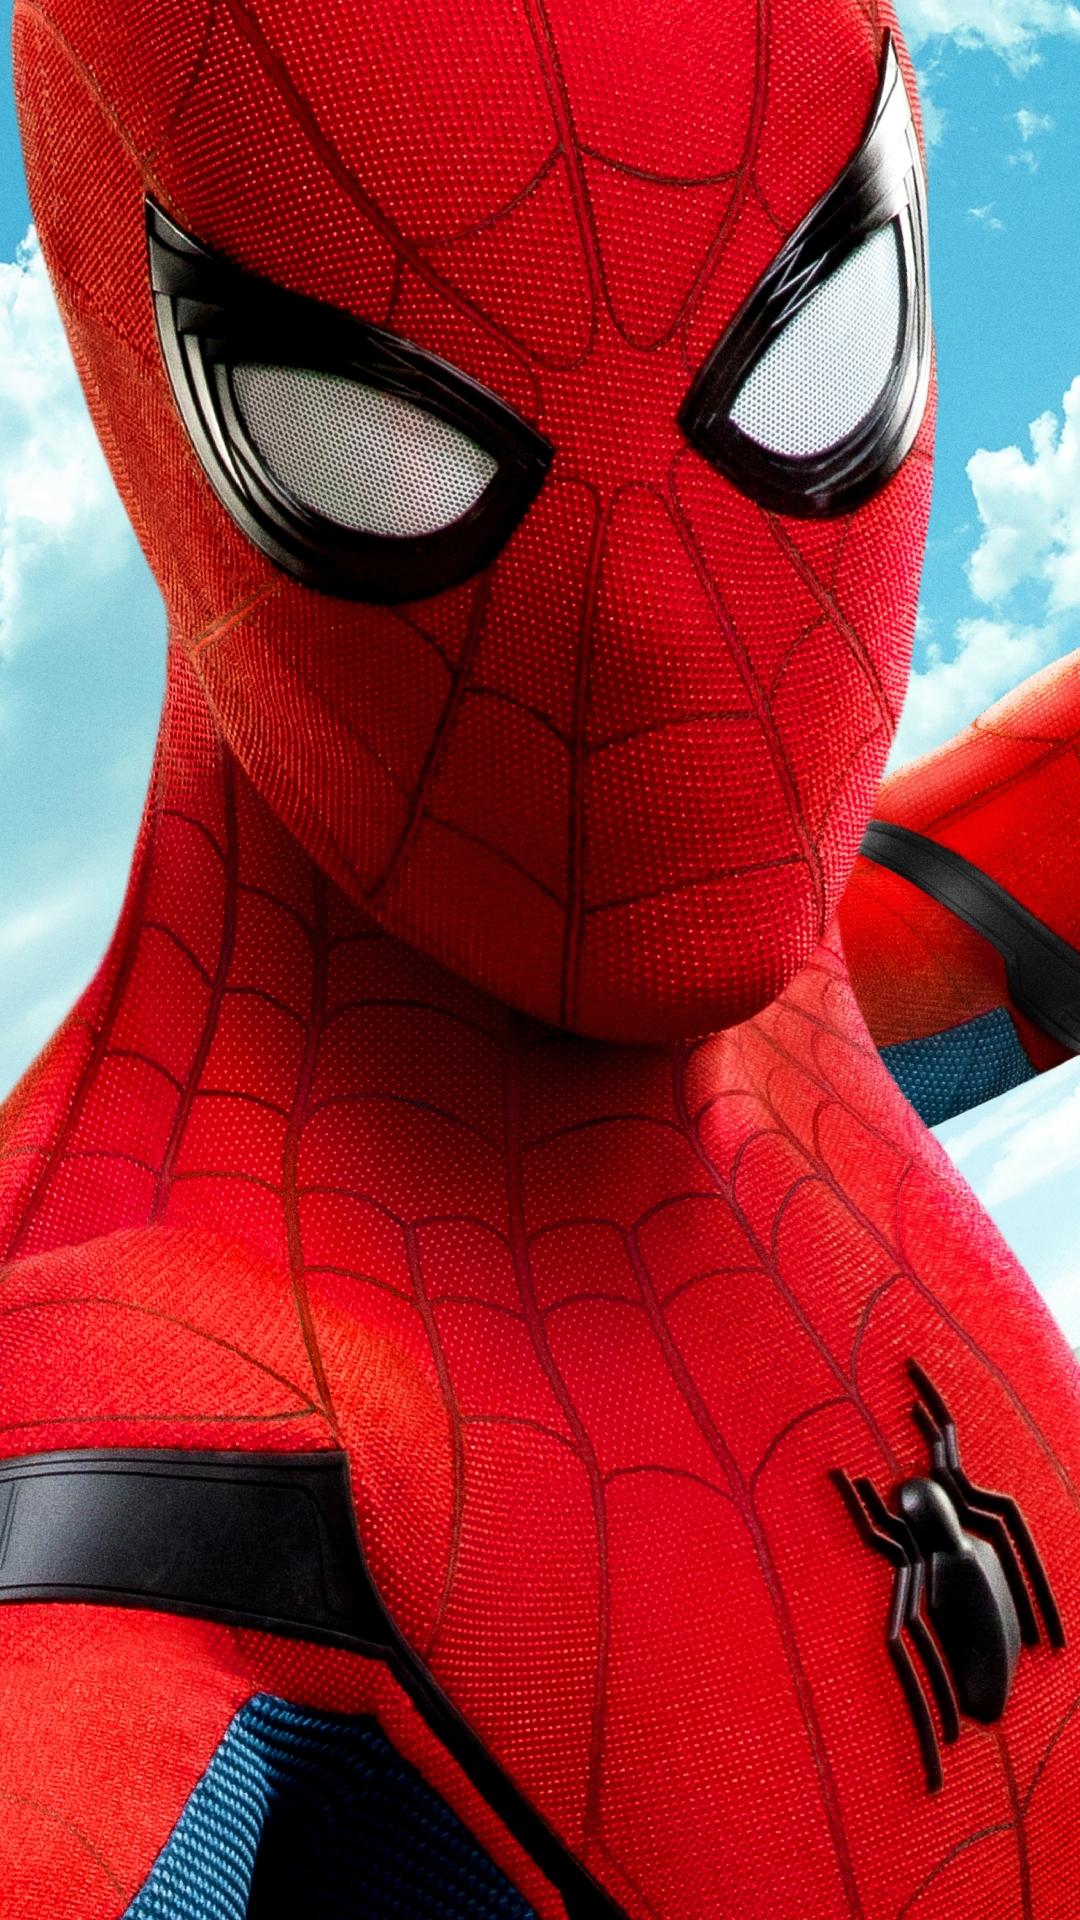 MovieSpider Man Homecoming 1080x1920 Wallpaper ID 686028 1080x1920